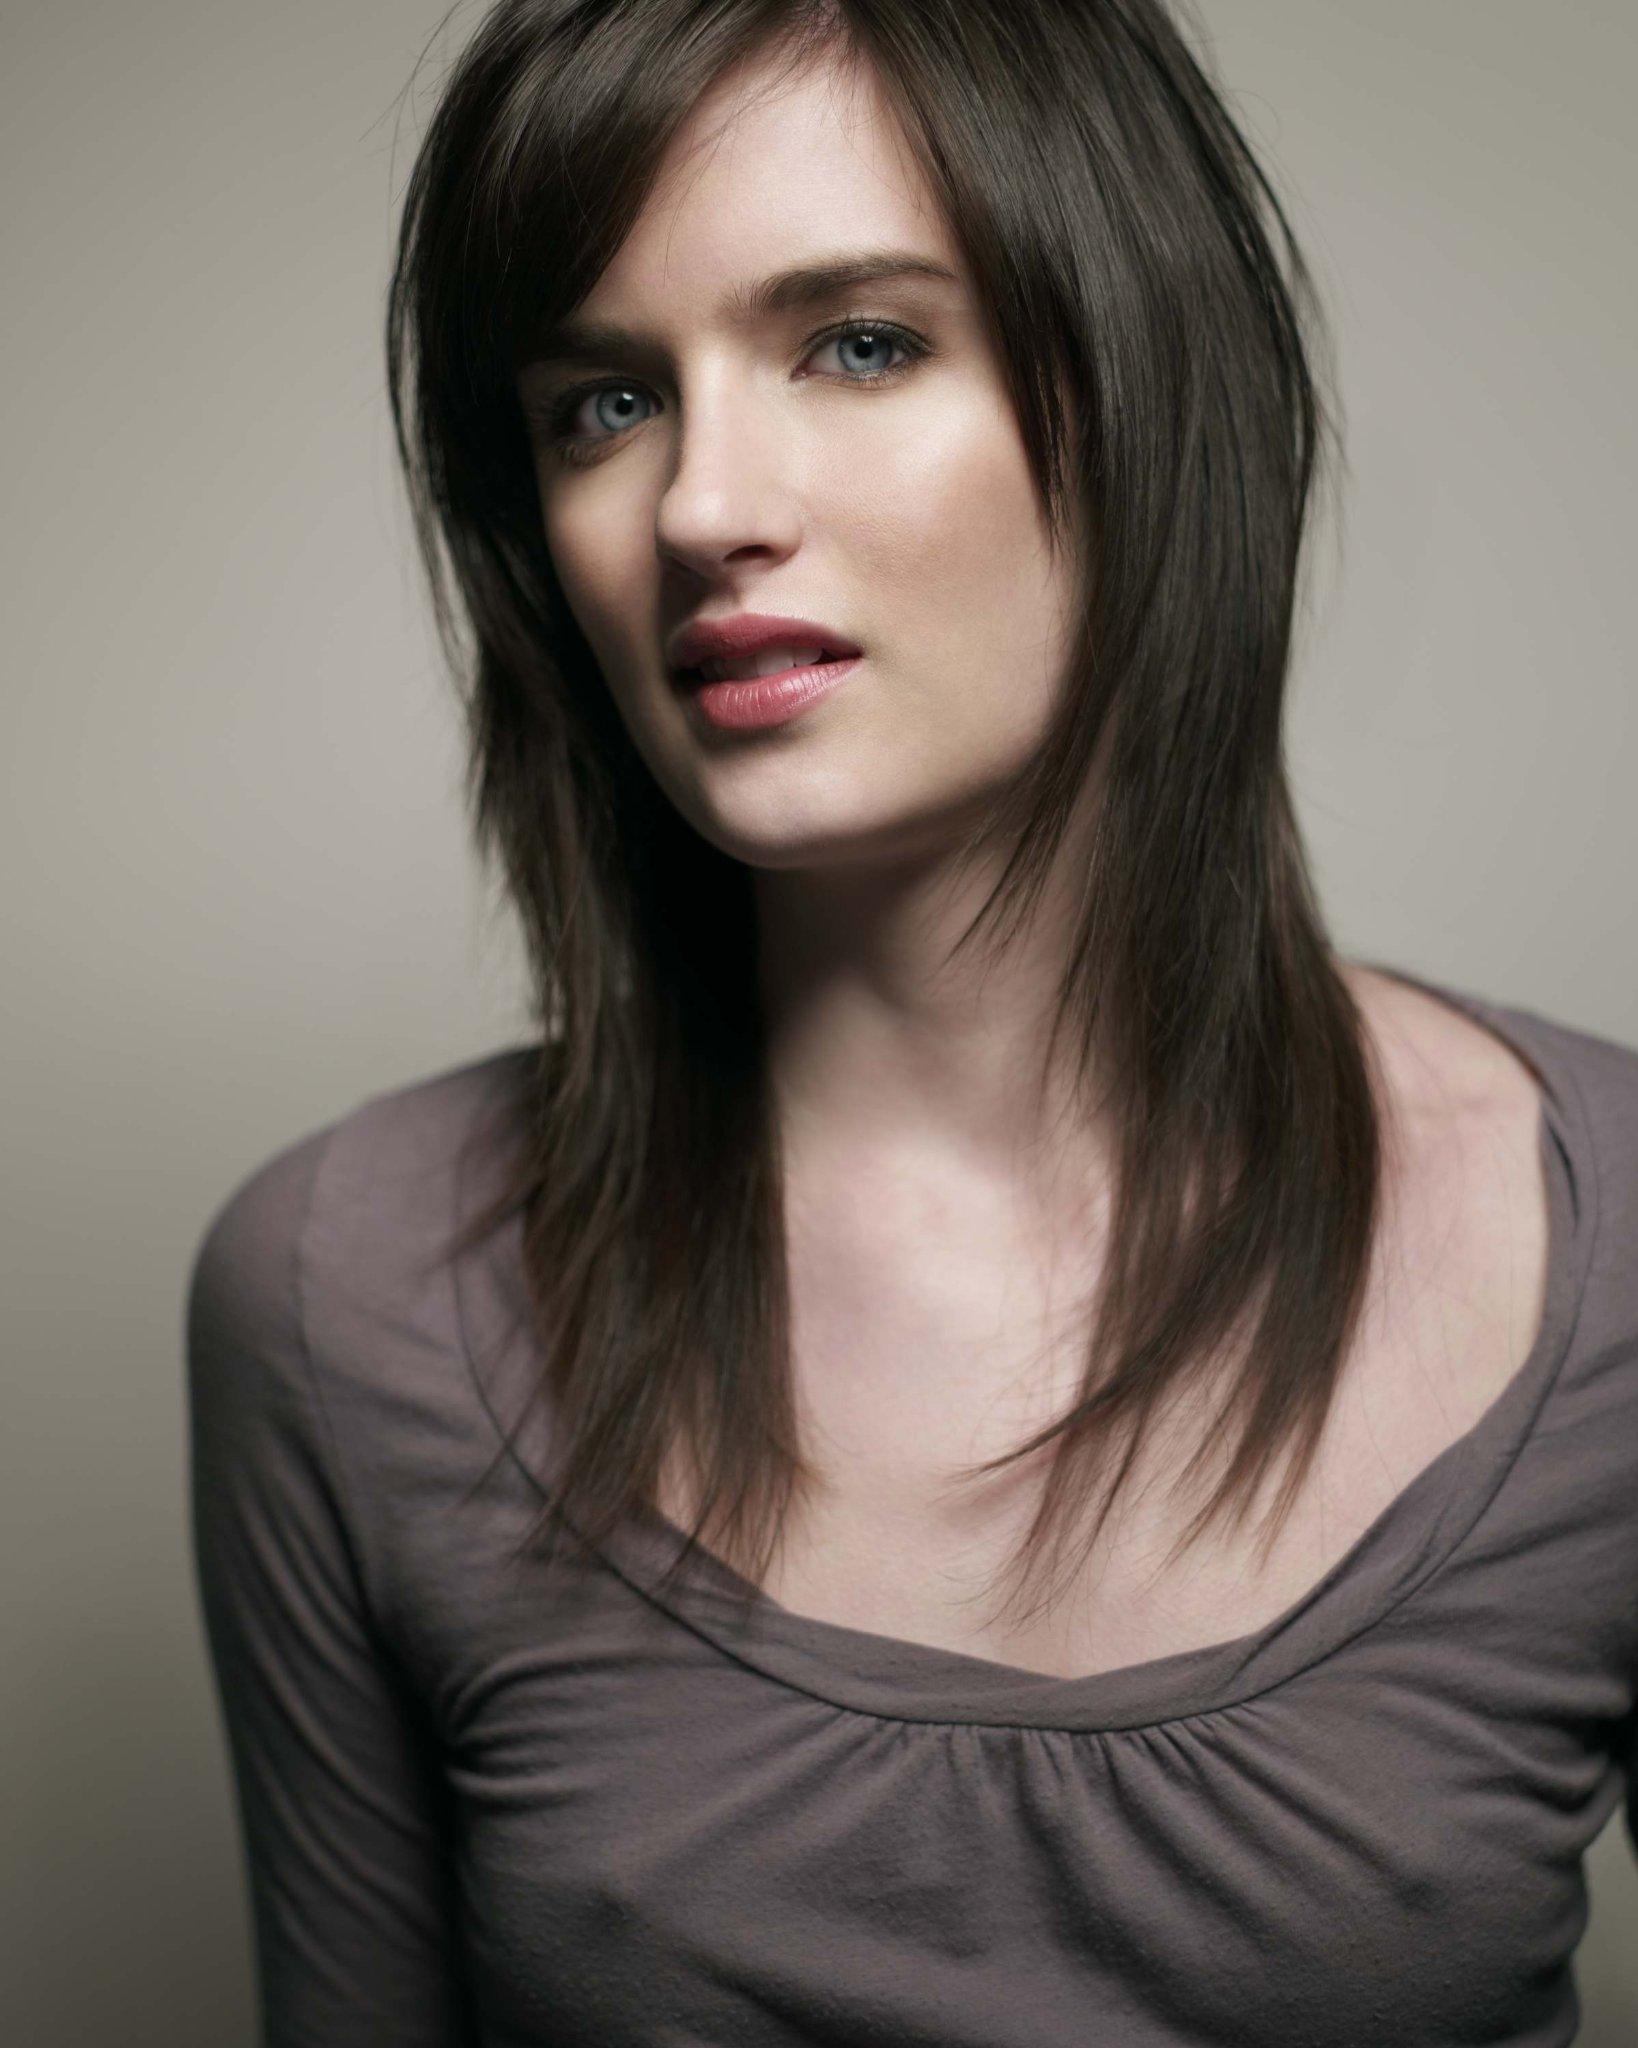 anna wood actress age